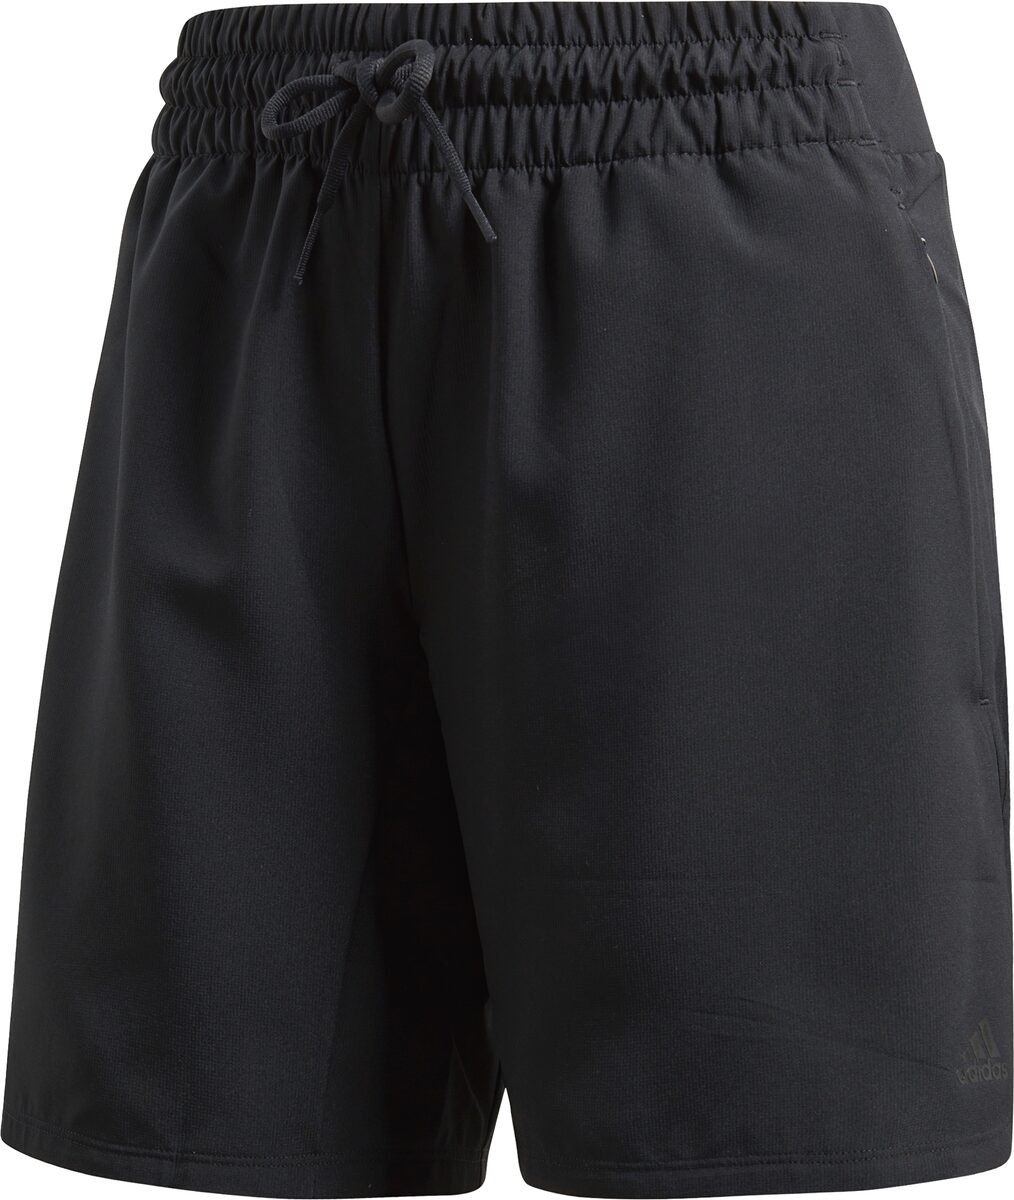 ADIDAS Damen Knee Length Shorts Art. Nr.: CW5492030